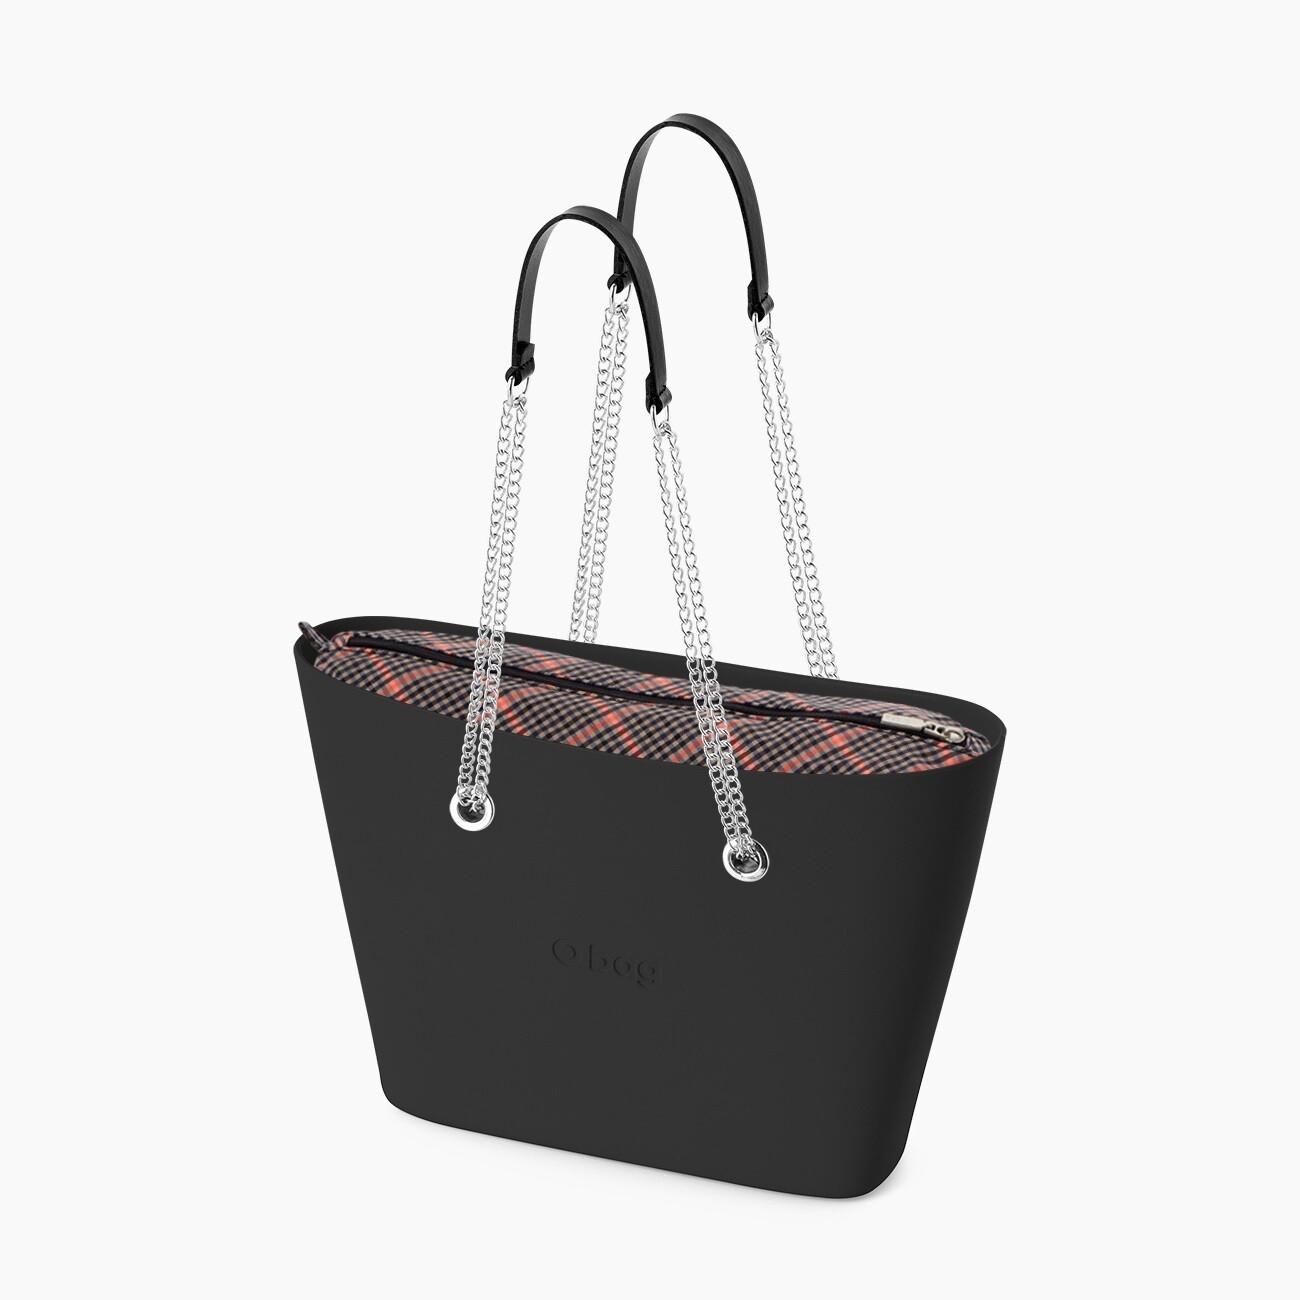 O bag urban black